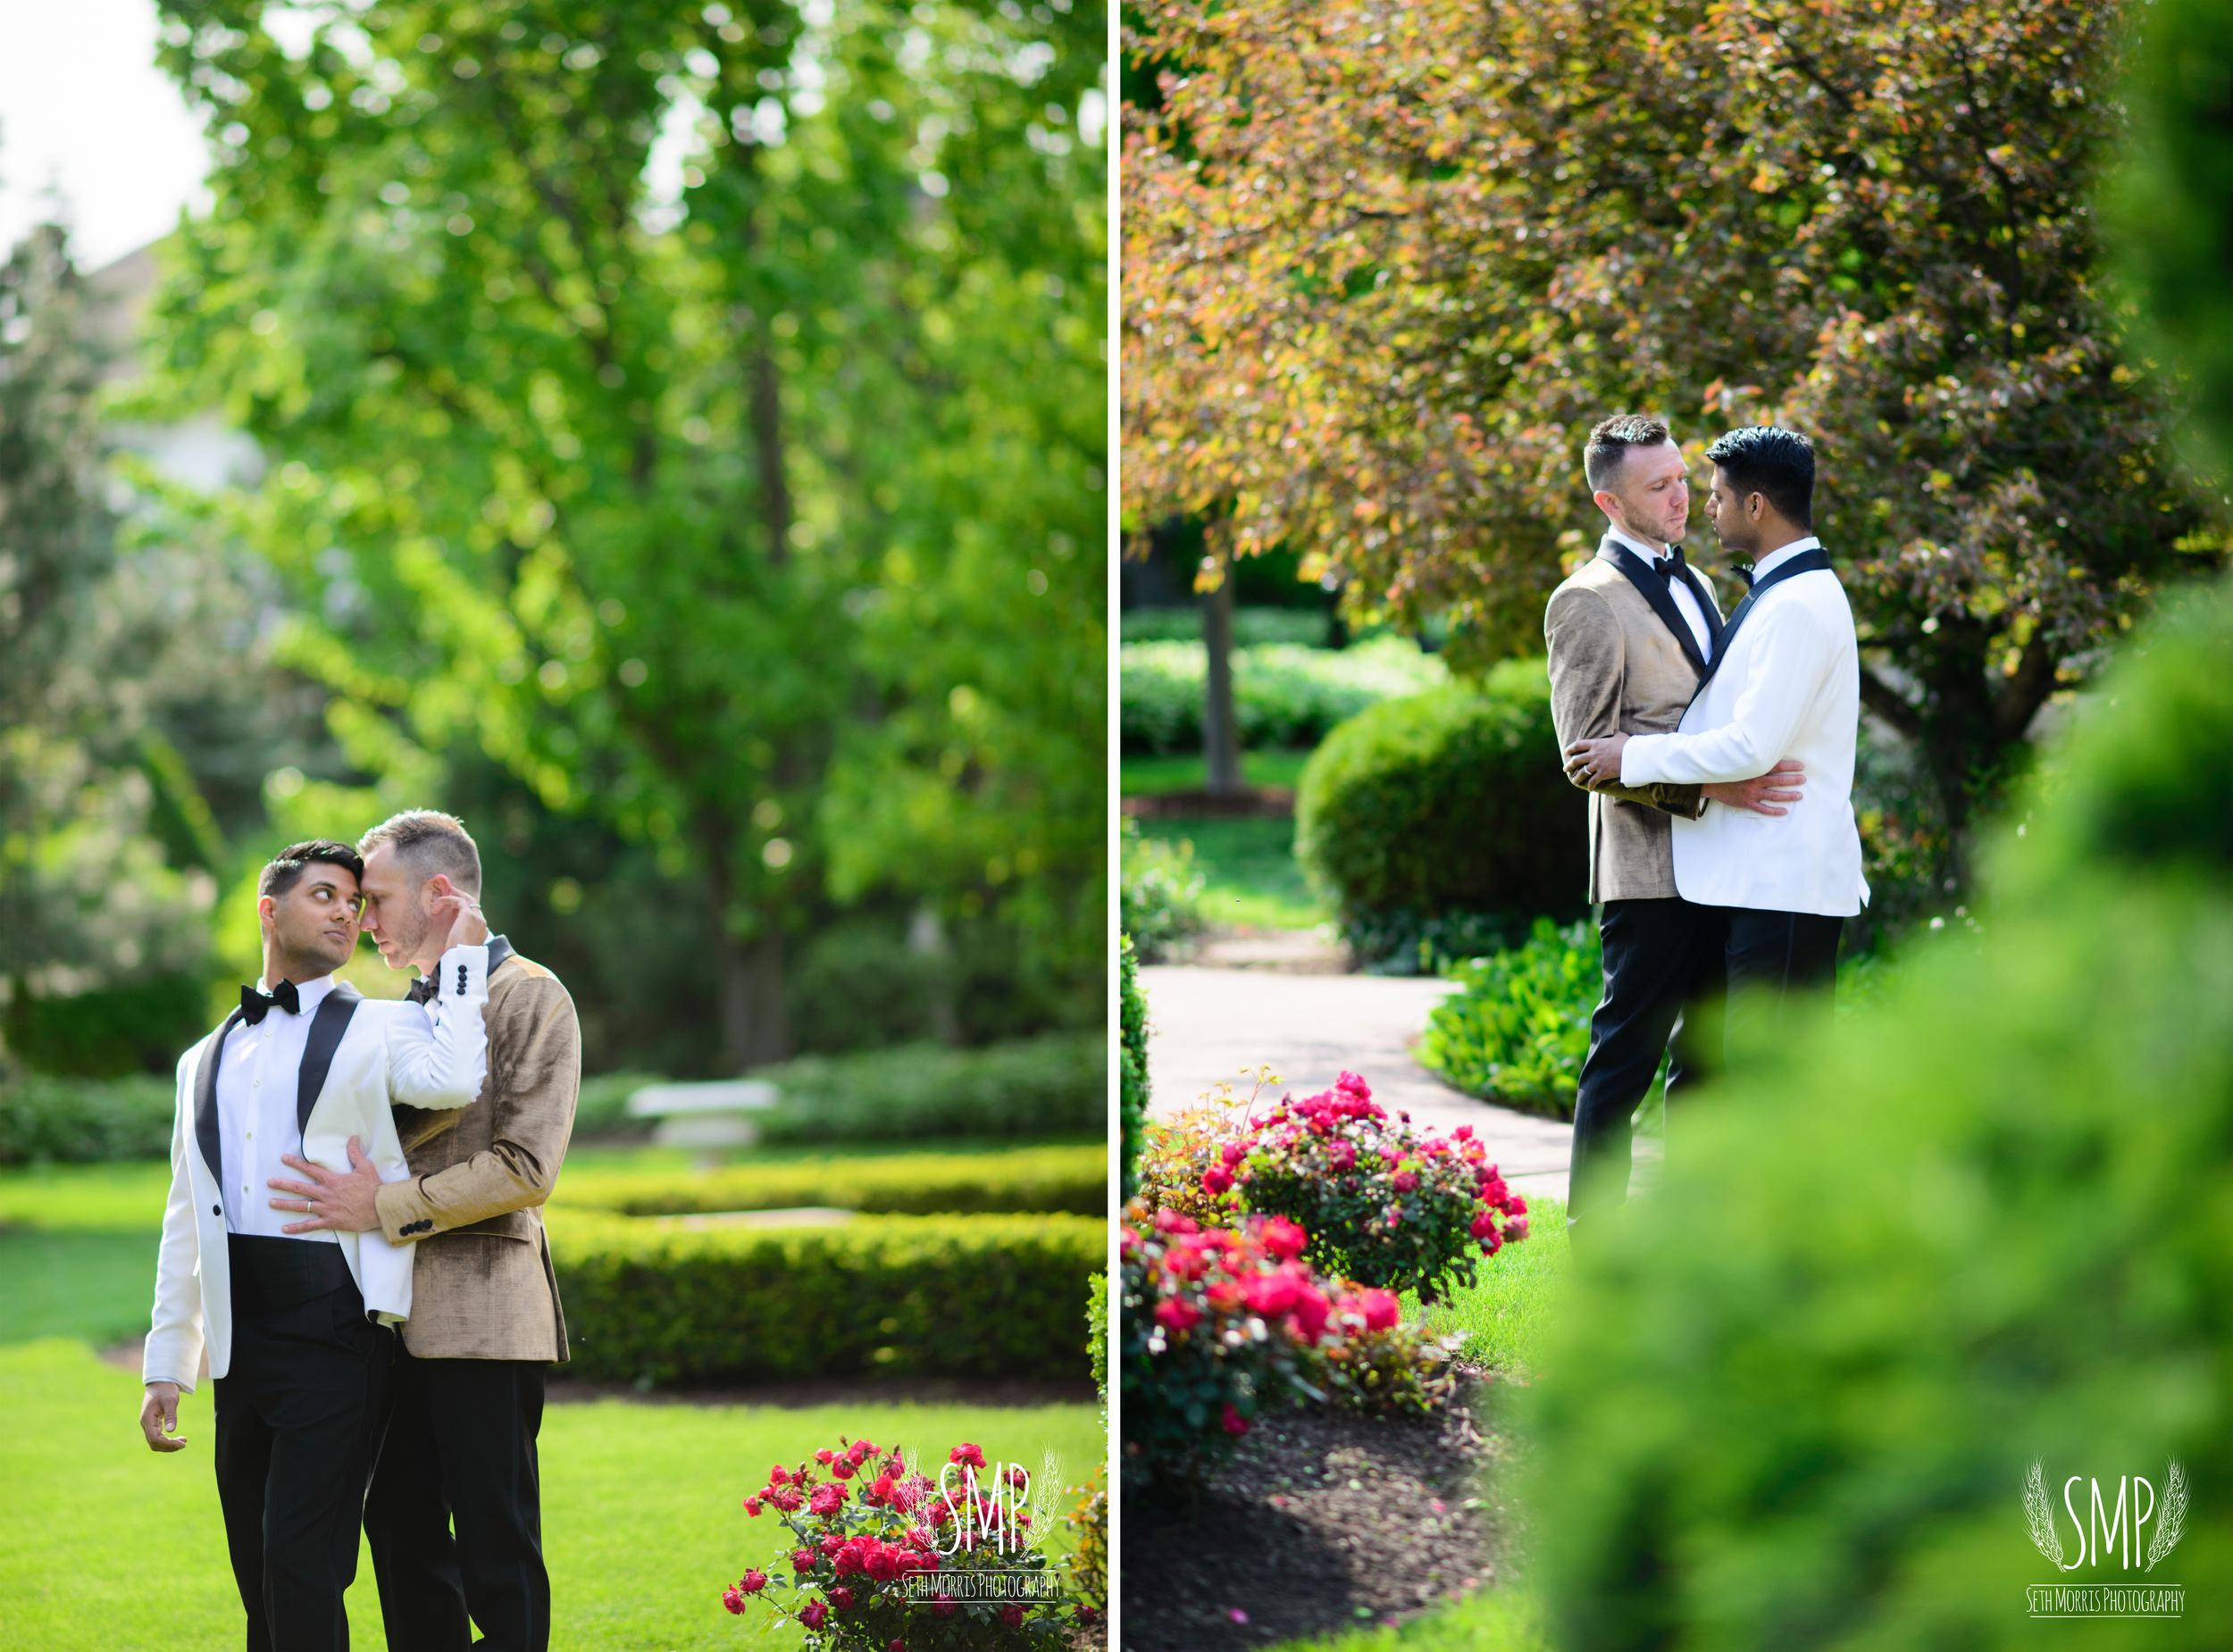 same-sex-wedding-photographer-chicago-illinois-42.jpg